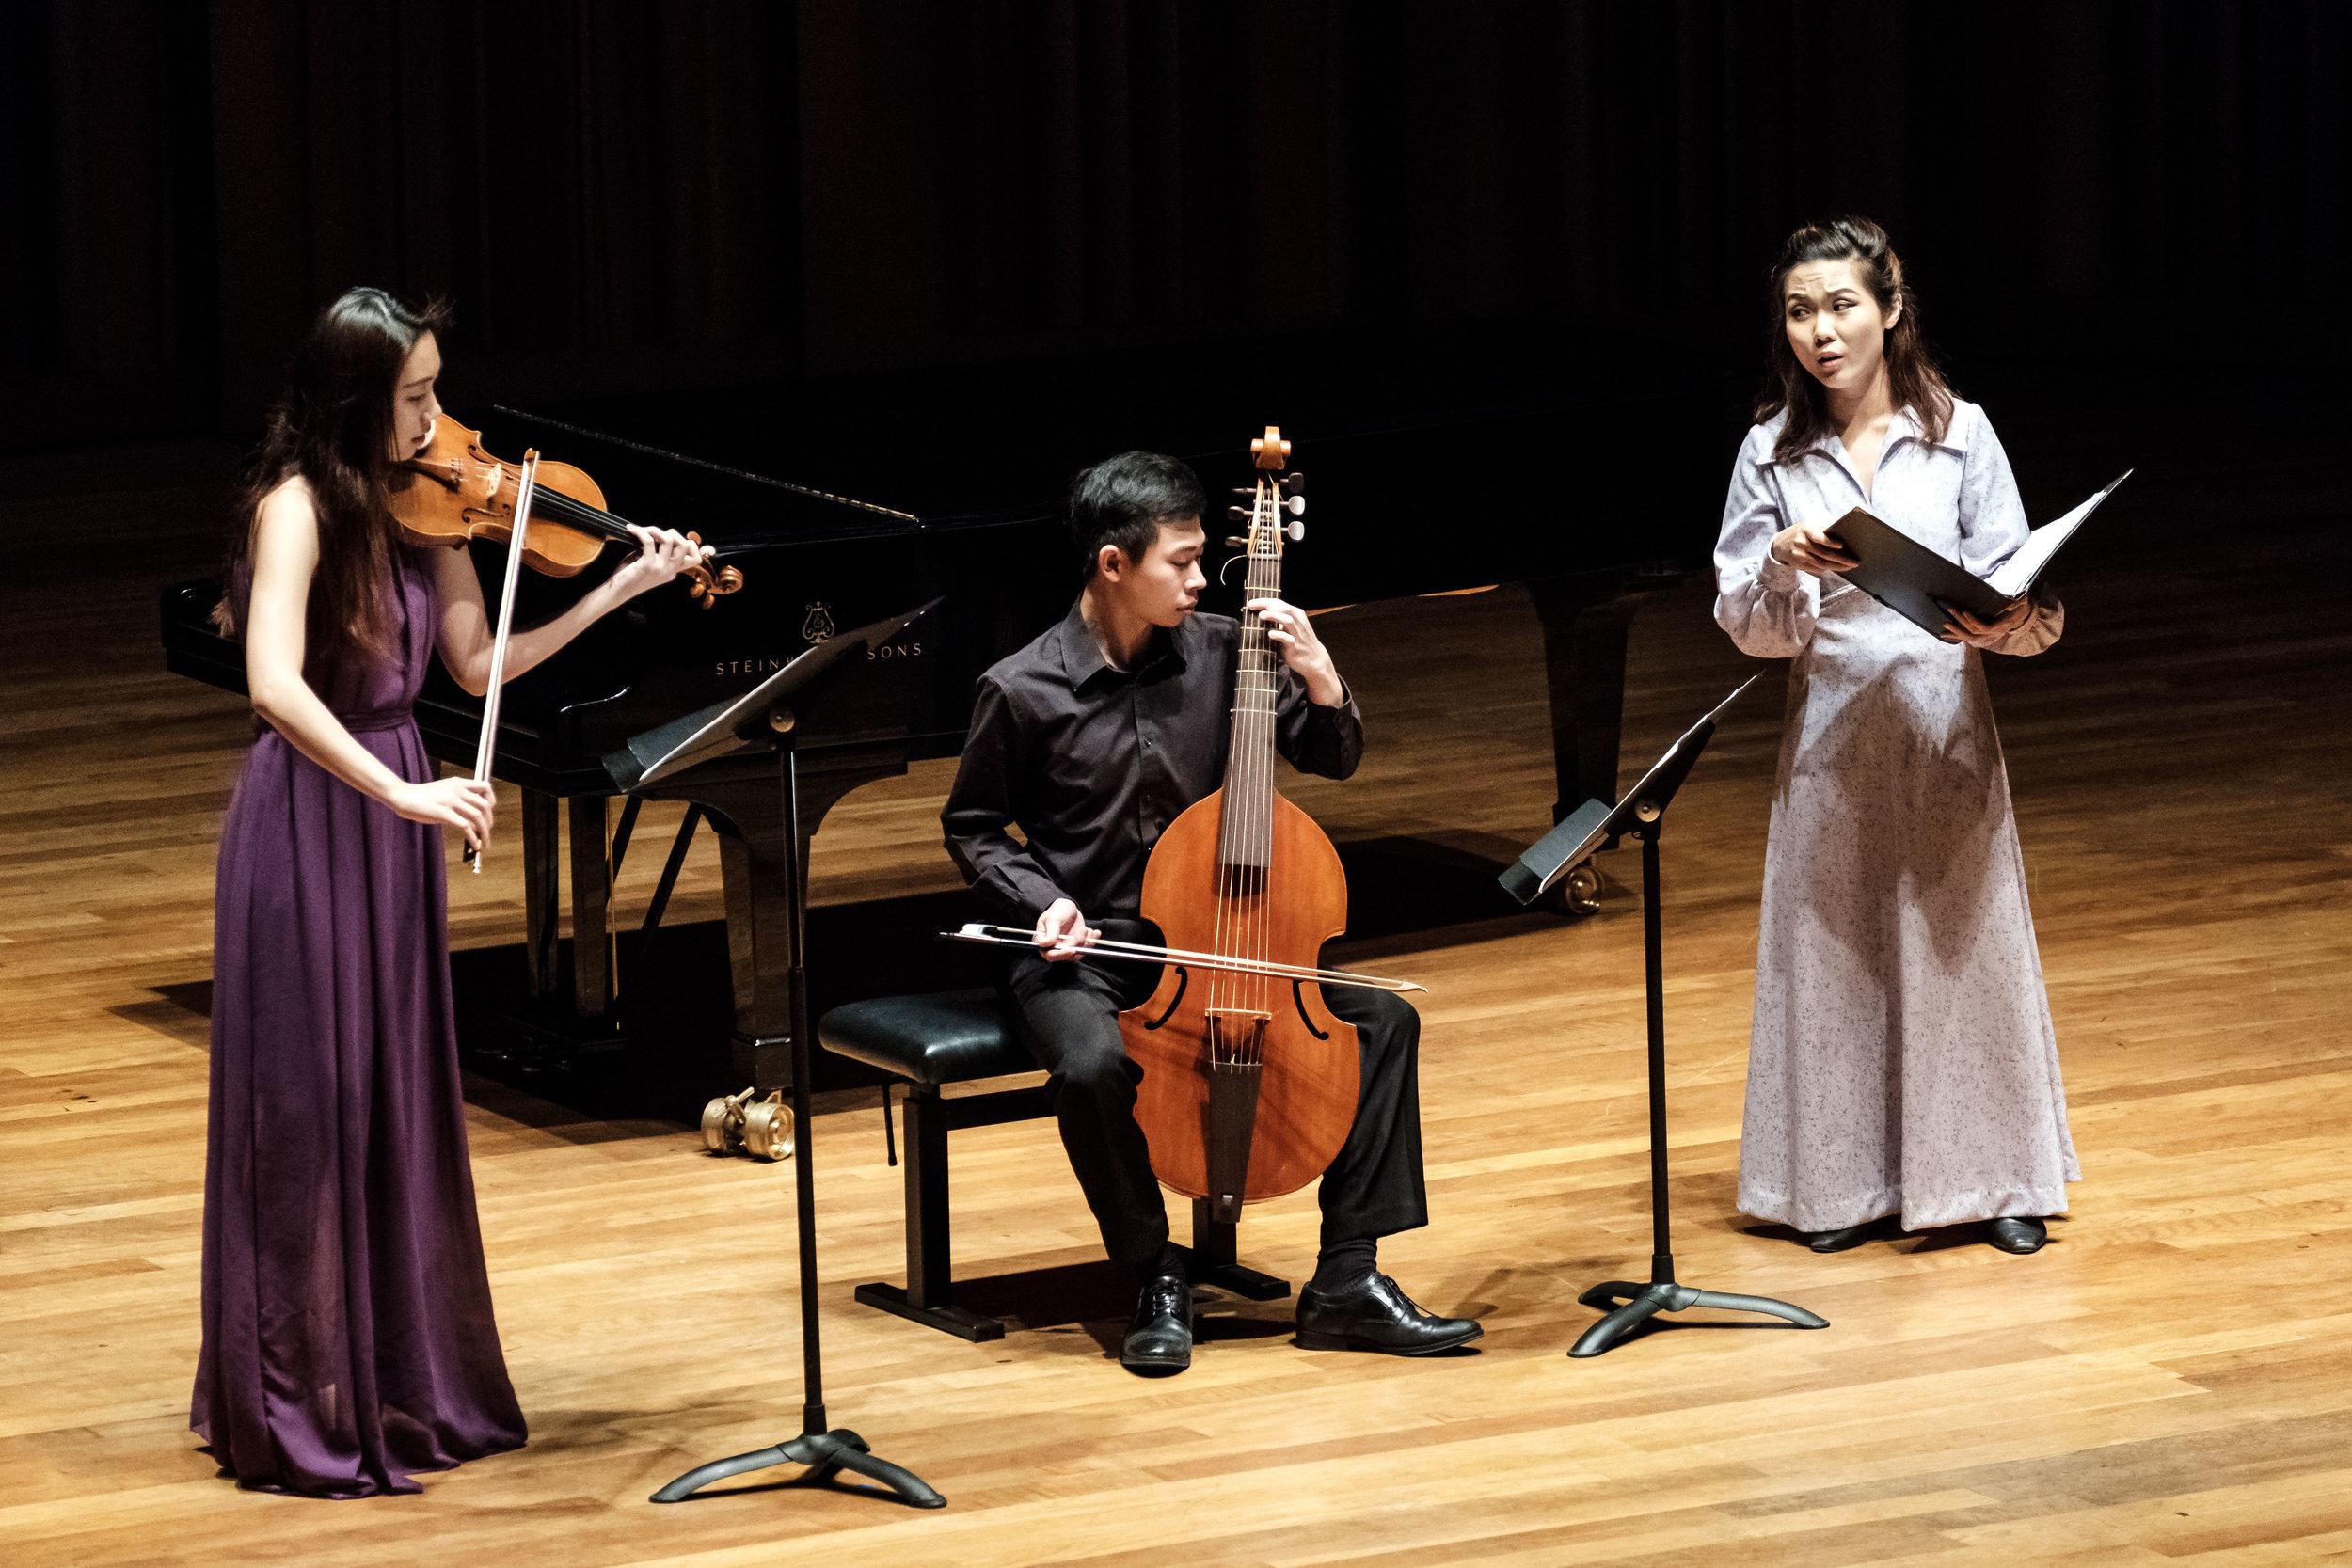 Jingyun performs medieval music in her senior recital, with Pei Yi Ting (violin) and Mervyn Lee (viola da gamba).